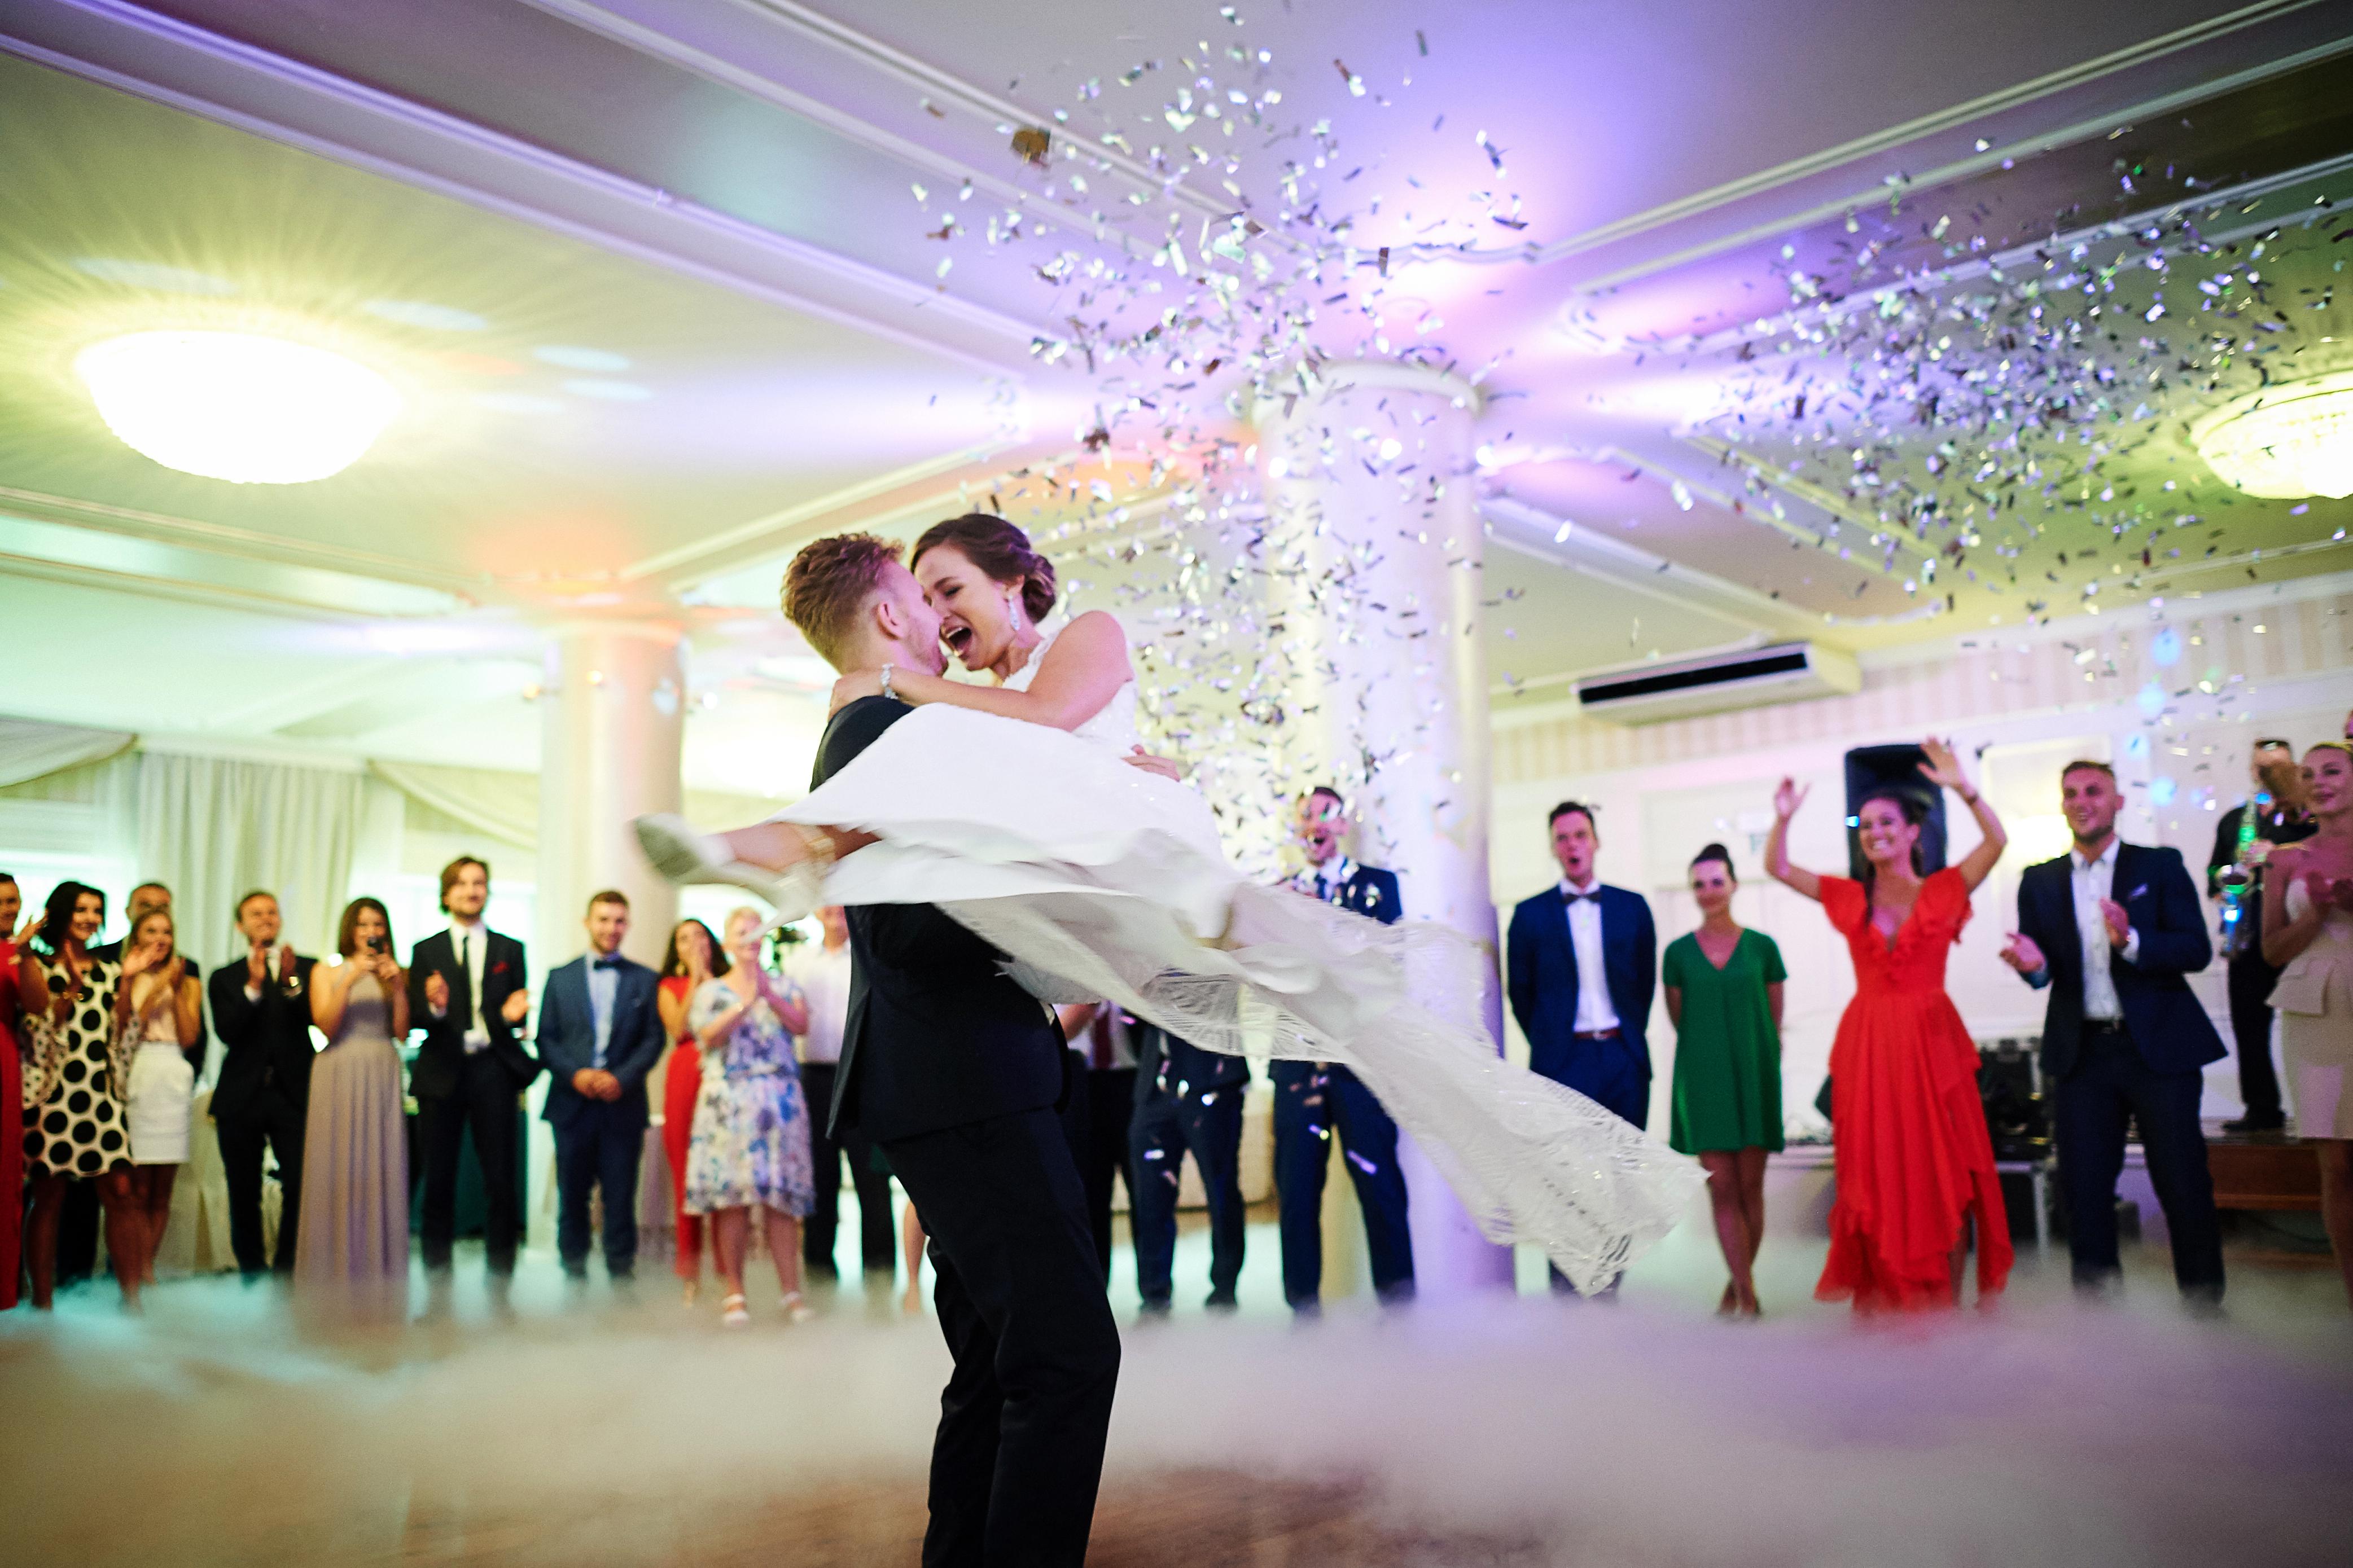 https://danceloveit.pl/pierwszy-taniec-mlodej-pary-danceloveit-szkola-tanca-bielsko/